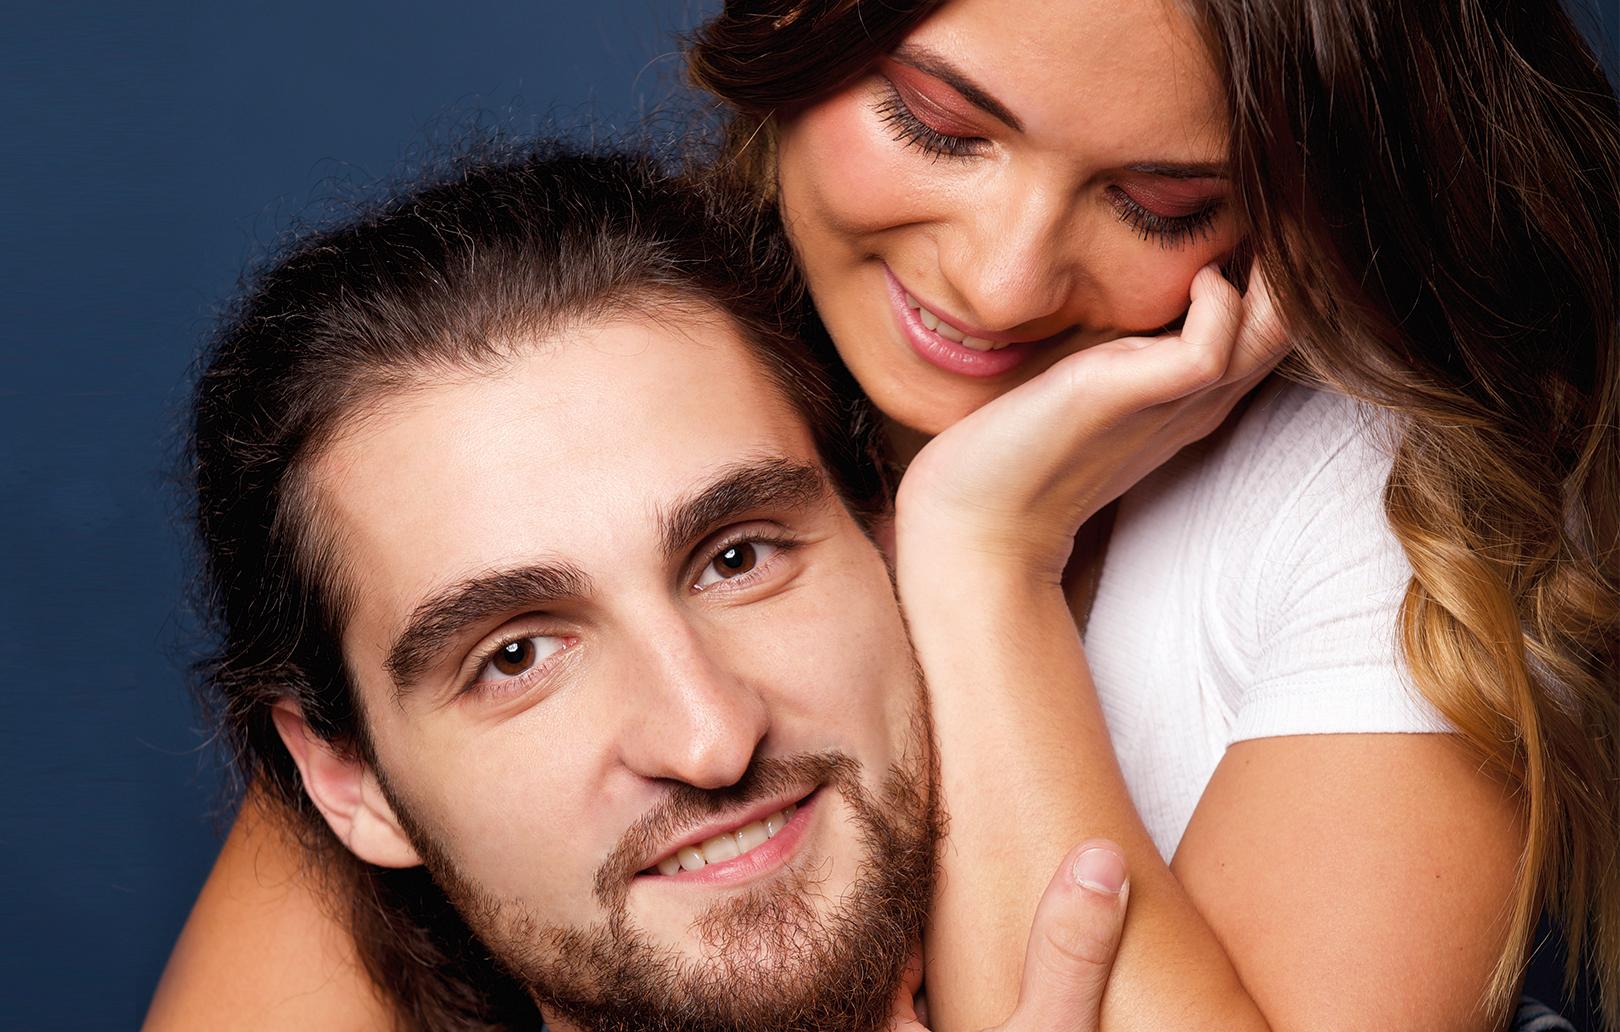 partner-fotoshooting-kassel-bg41617878651